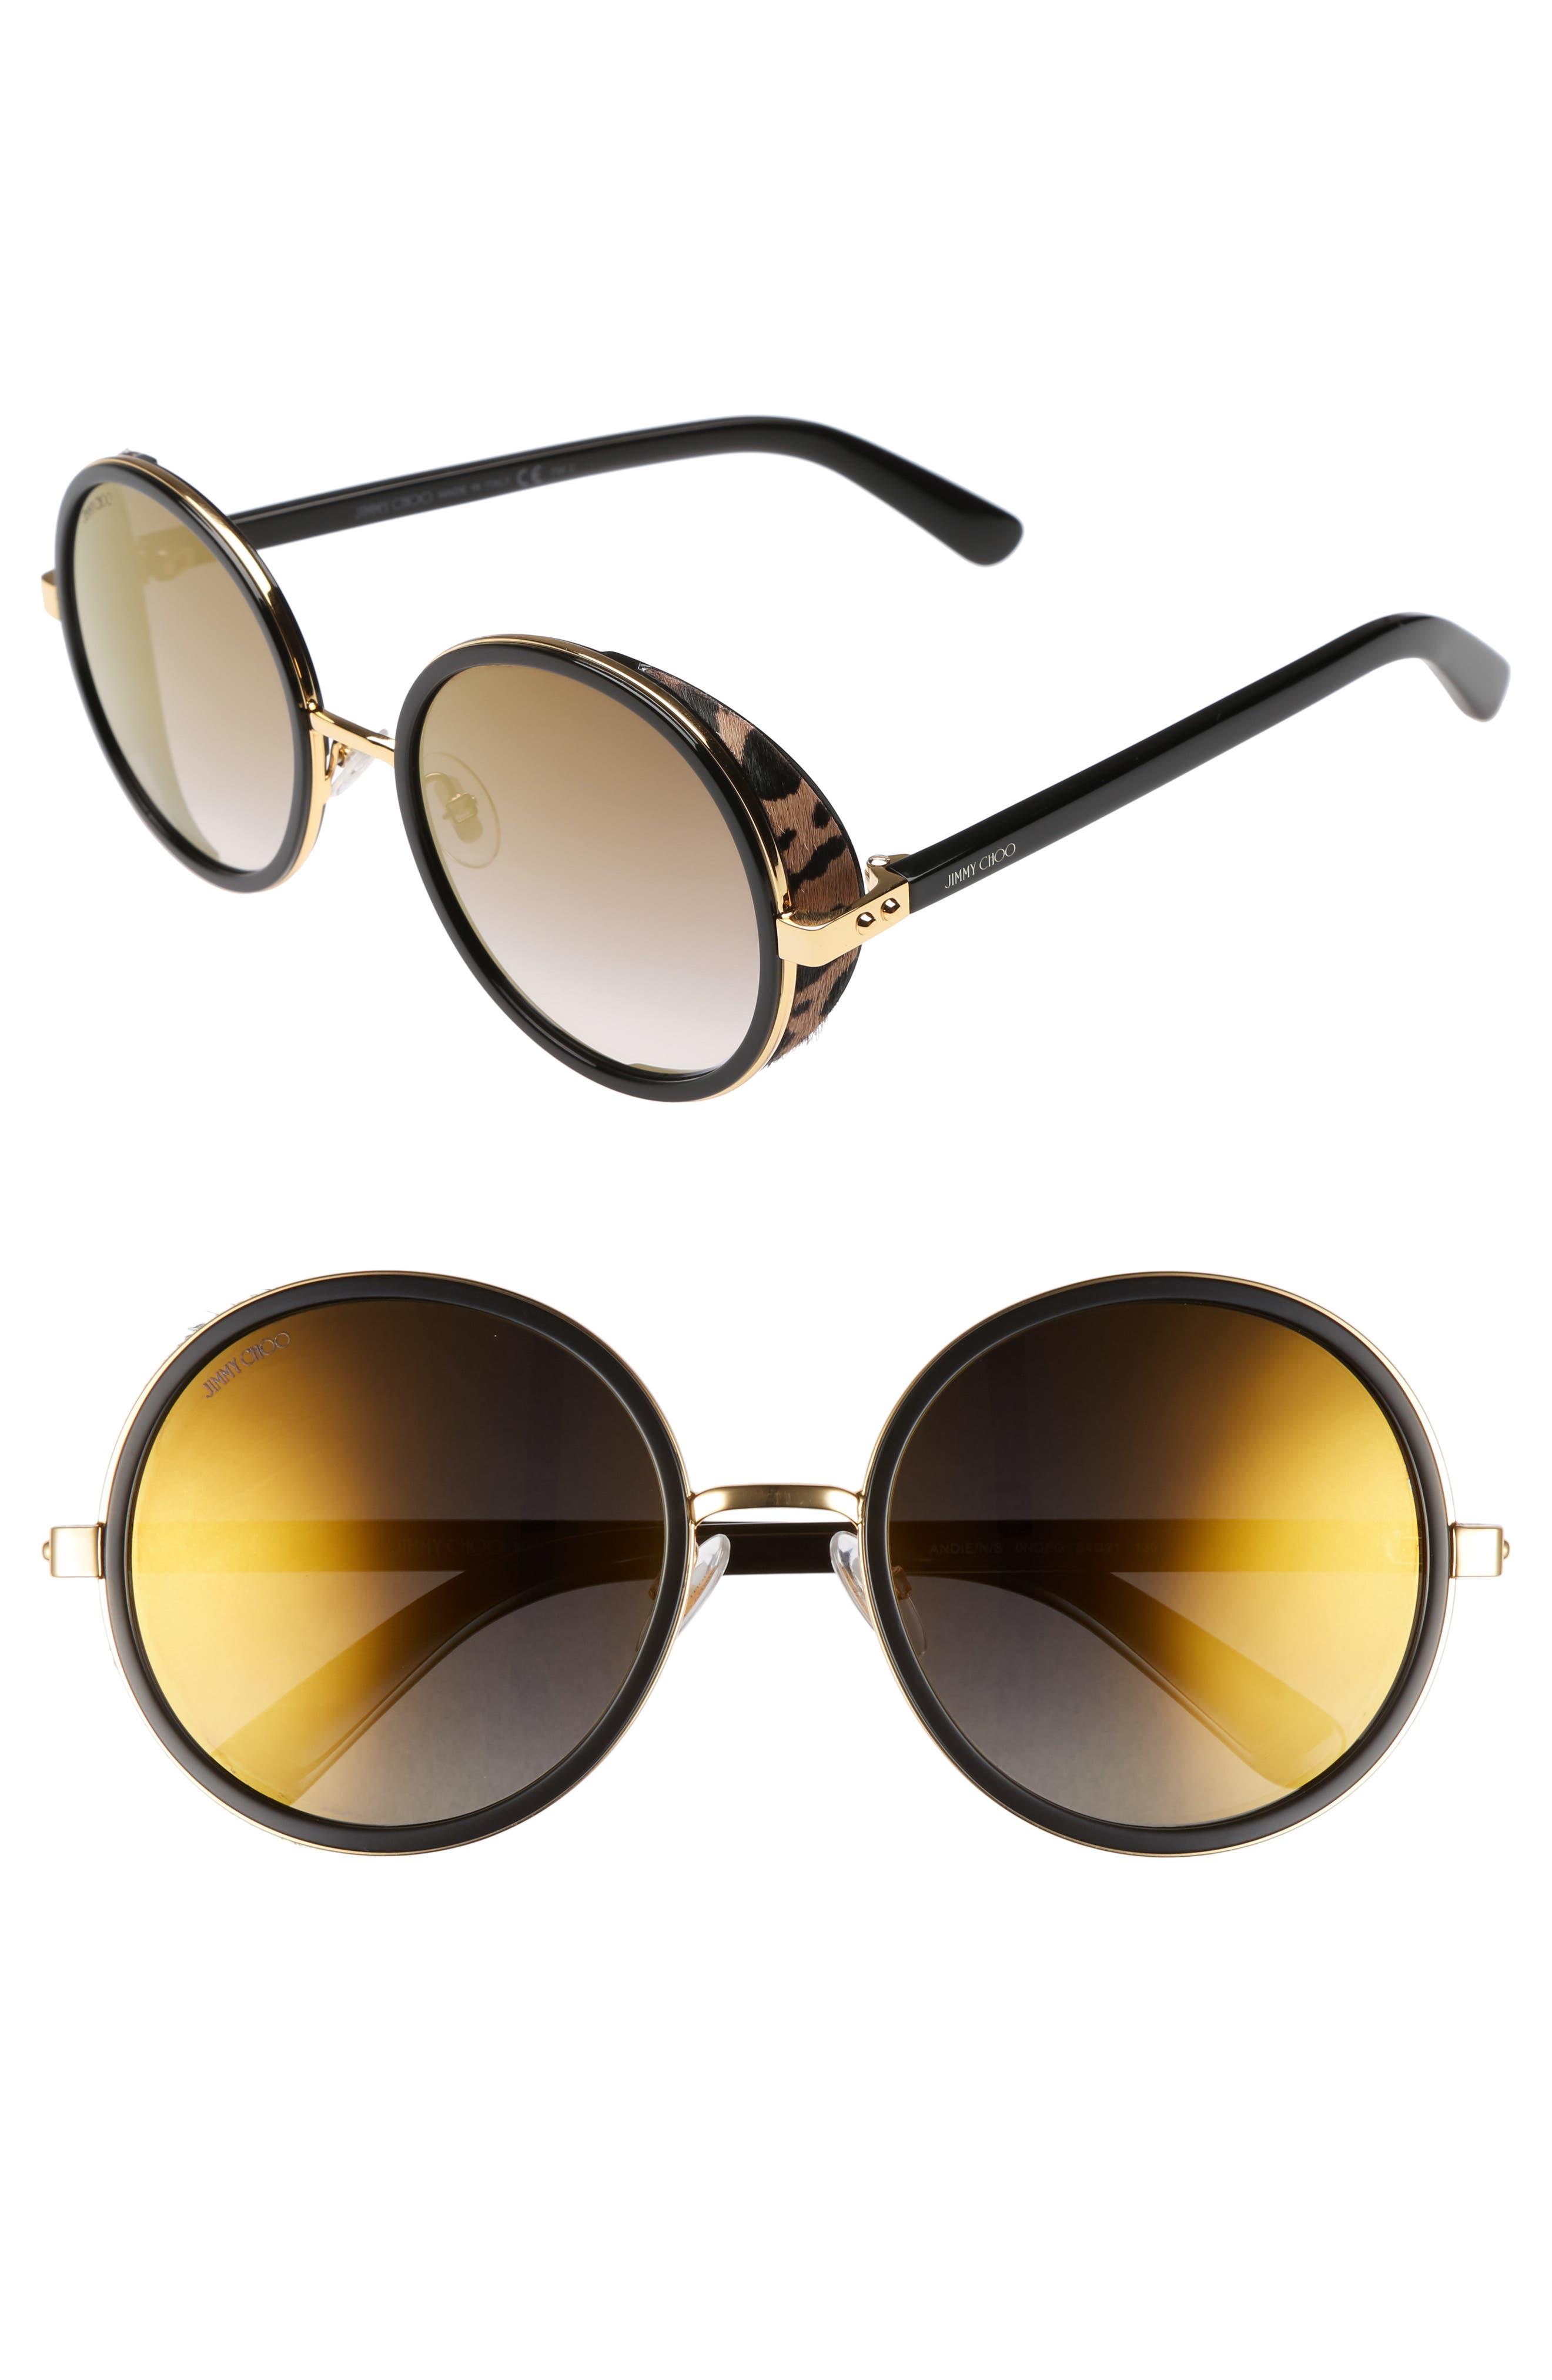 Alternate Image 1 Selected - Jimmy Choo Andiens 54mm Round Sunglasses